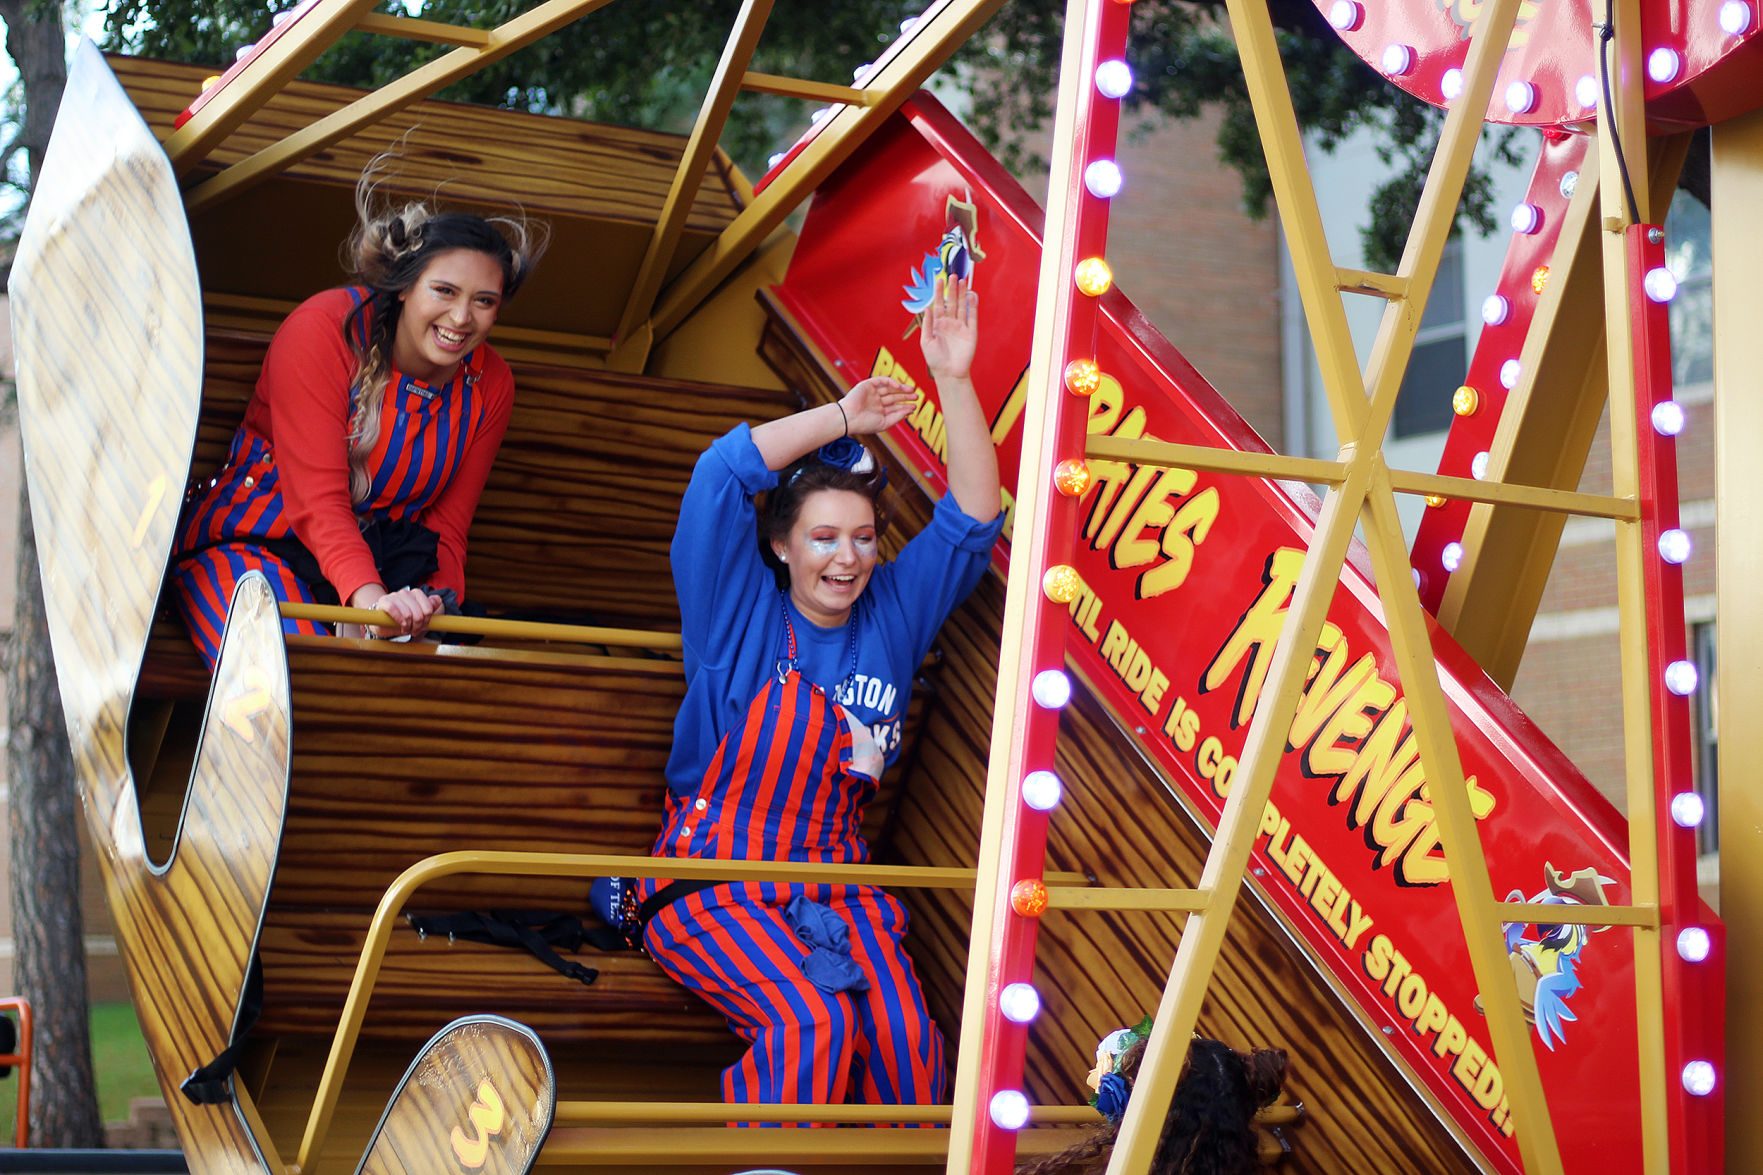 UTA students show spirit during MAVchella-themed Homecoming Parade